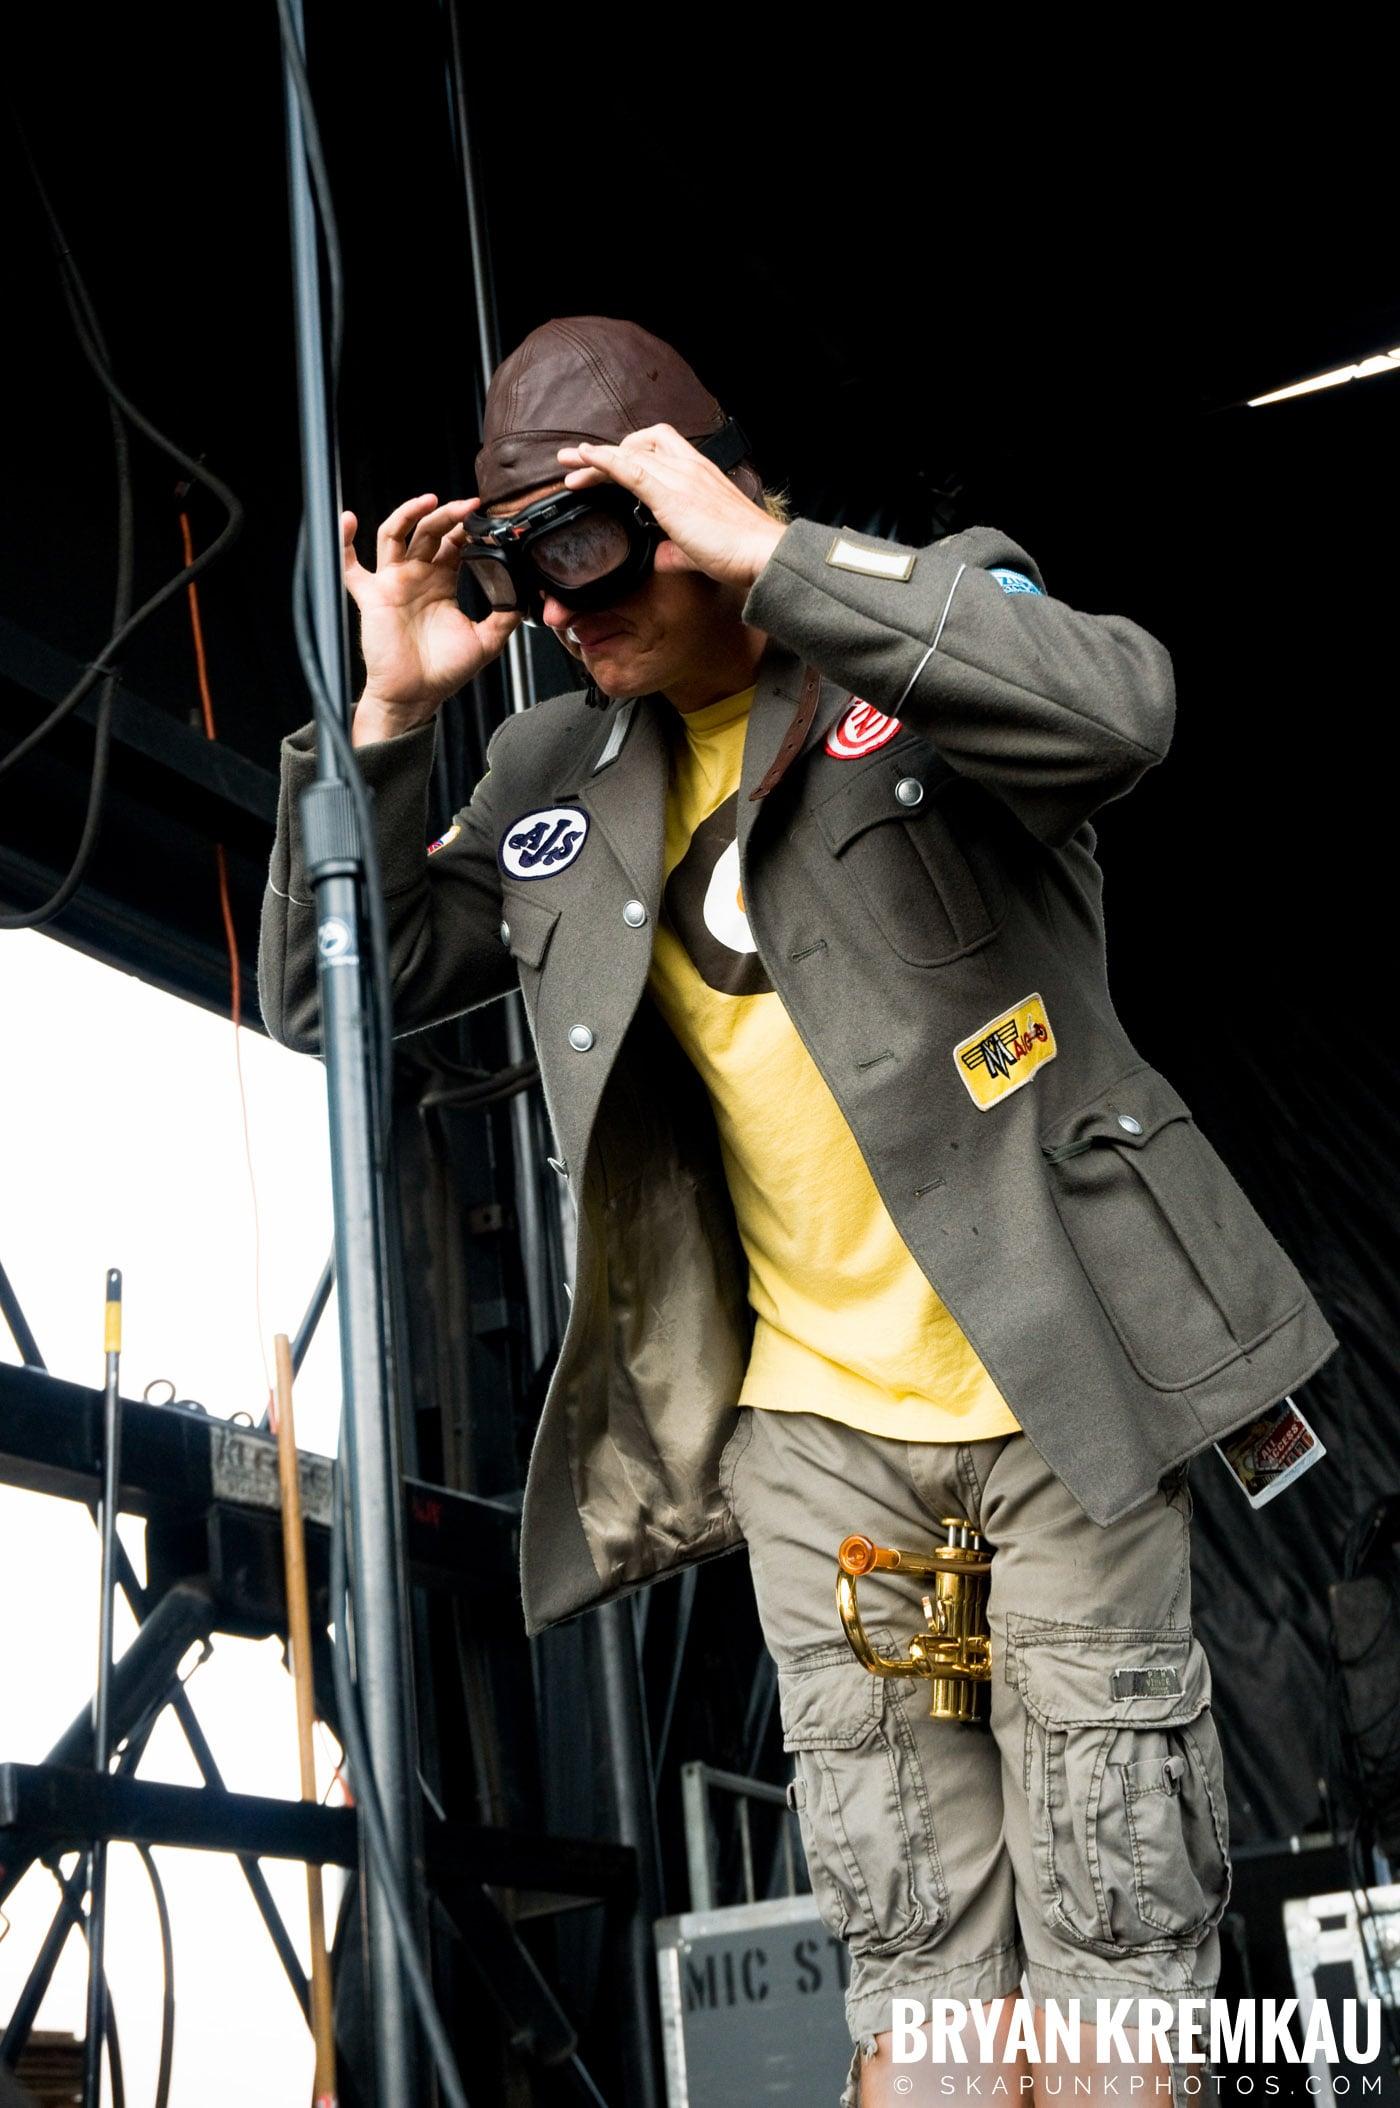 Reel Big Fish @ Warped Tour 08, Scranton PA - 7.27.08 (4)